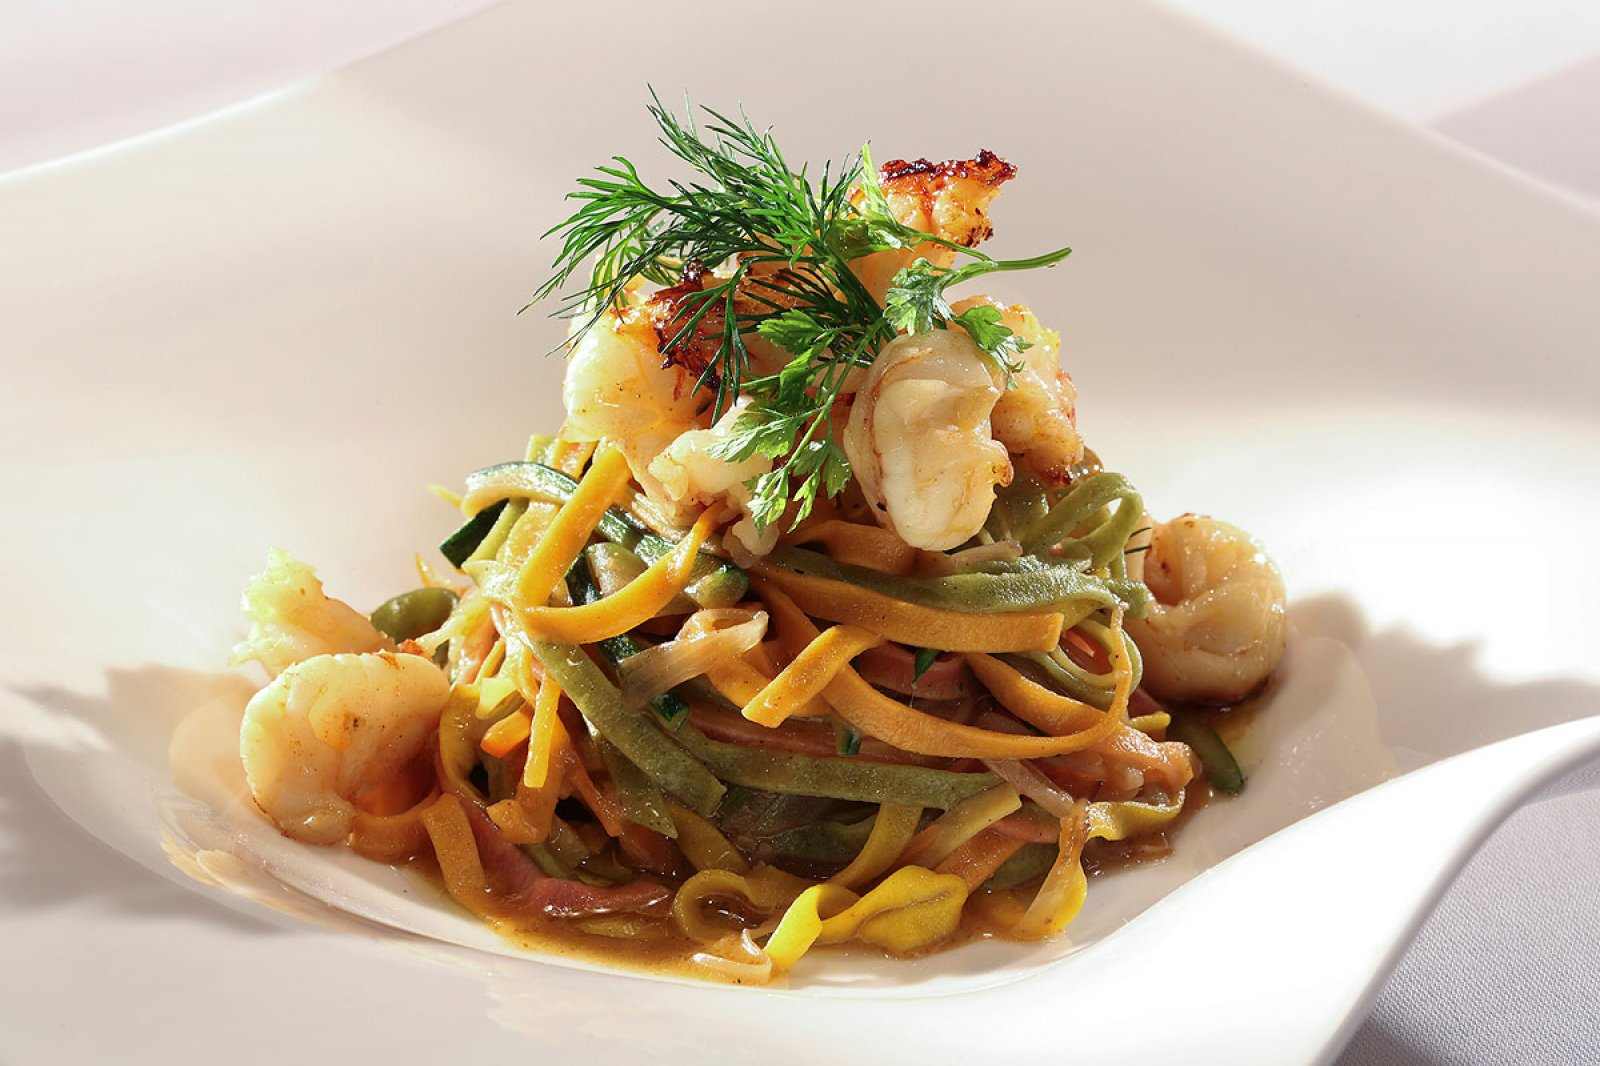 Ristorante a base di Pesce a Parma Conduzione e Cucina Familiare | Ristorante Pizzeria Luna Blu